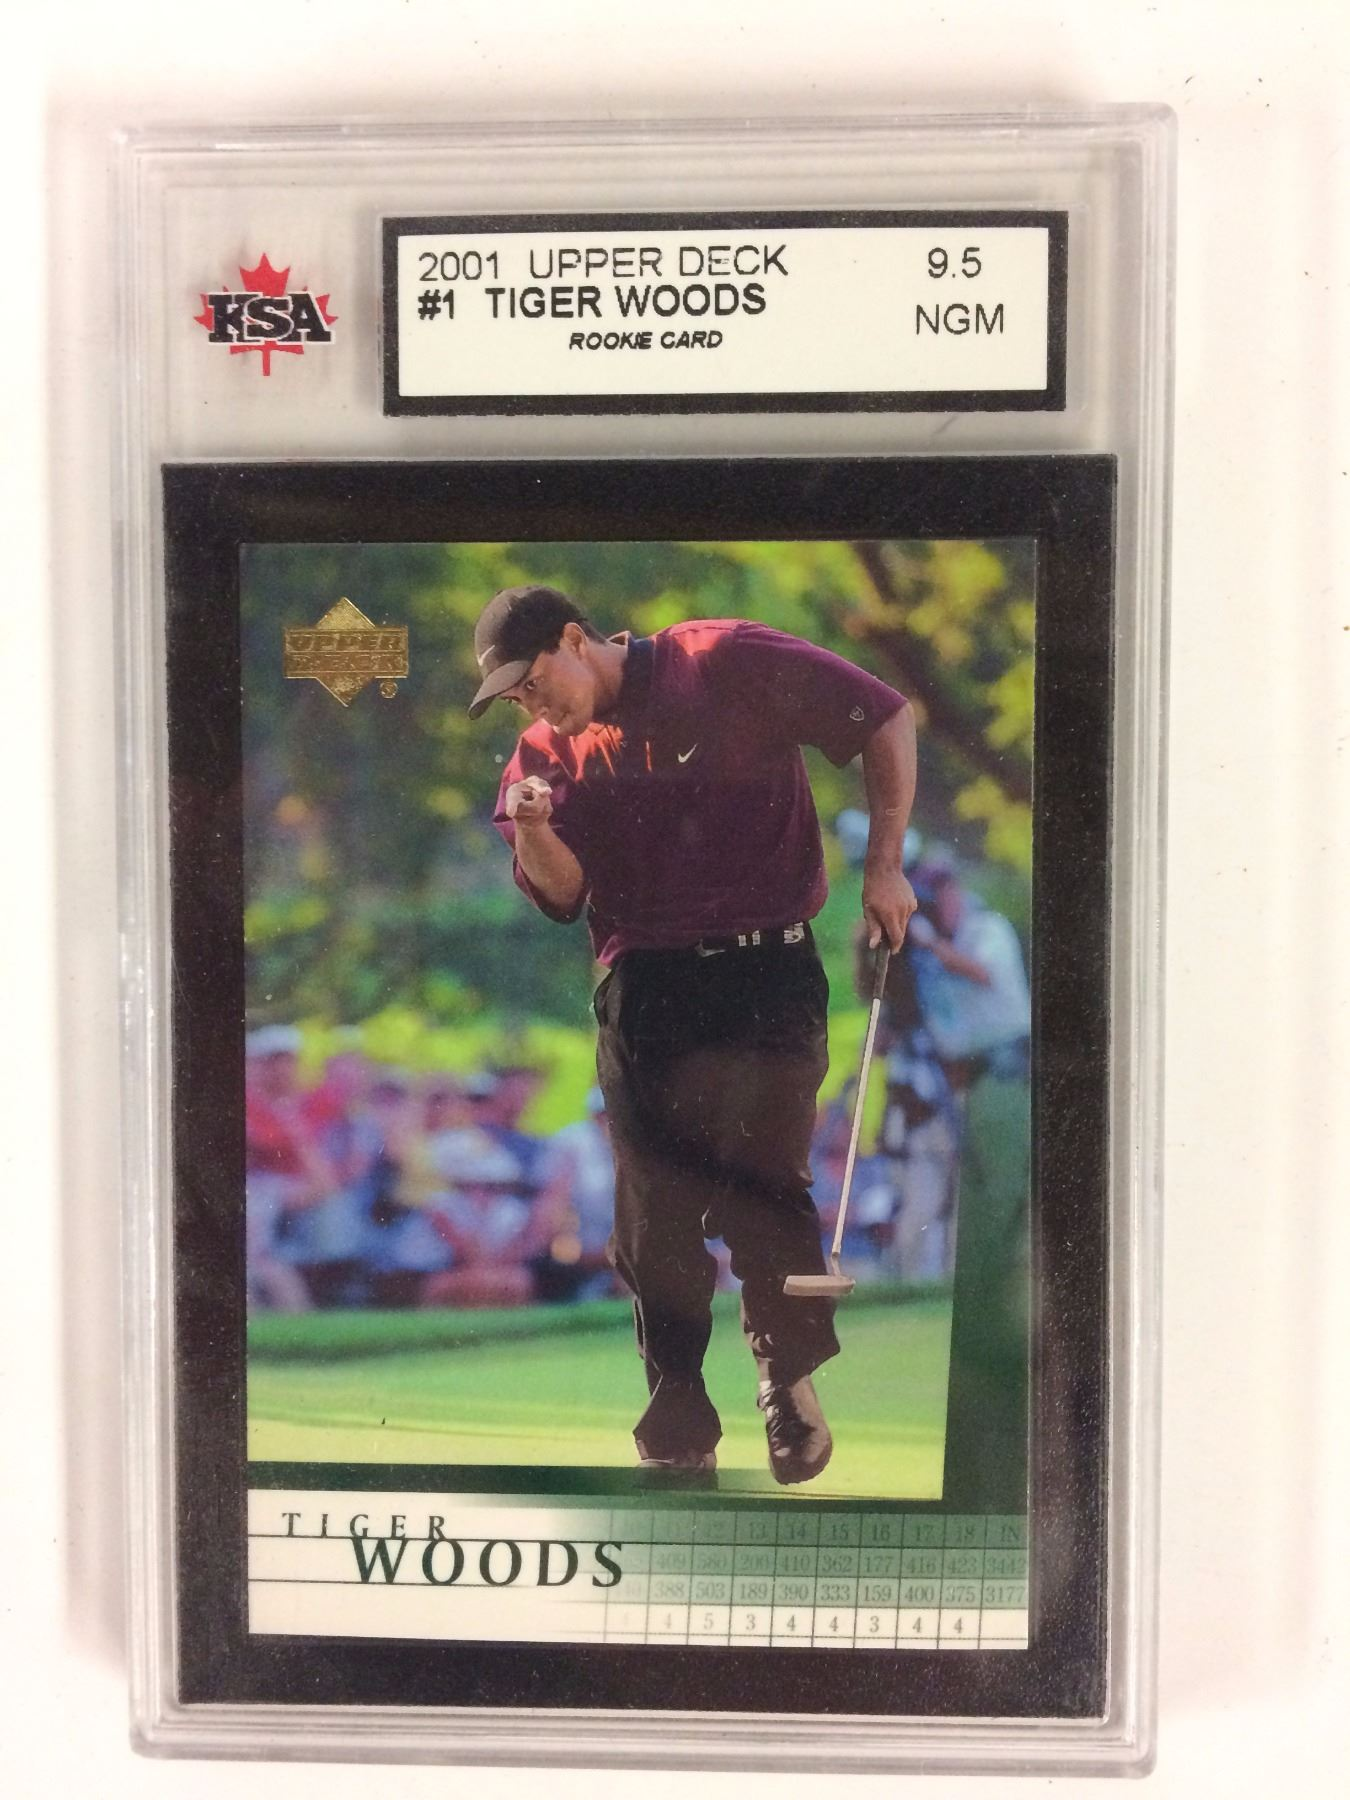 2001 Upper Deck 1 Tiger Woods Rookie Card 95 Ngm Ksa